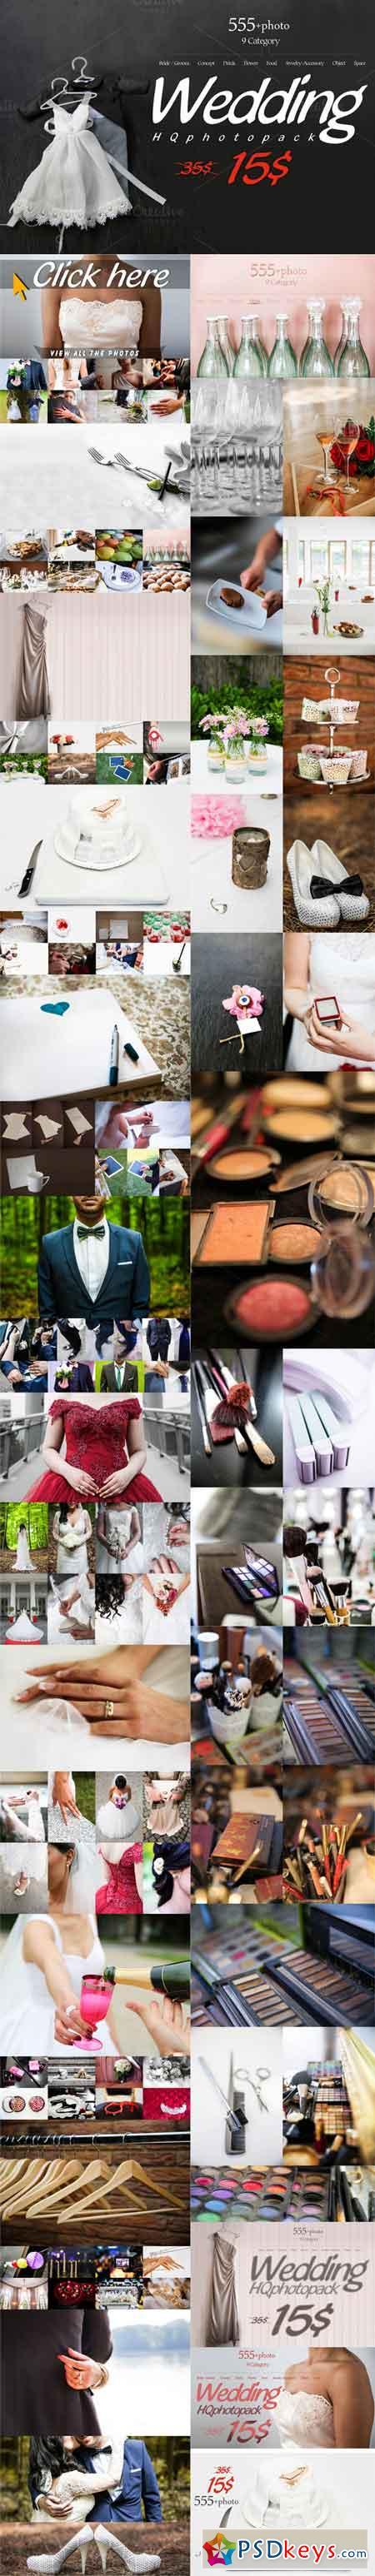 555+Photo Wedding Pack 385274